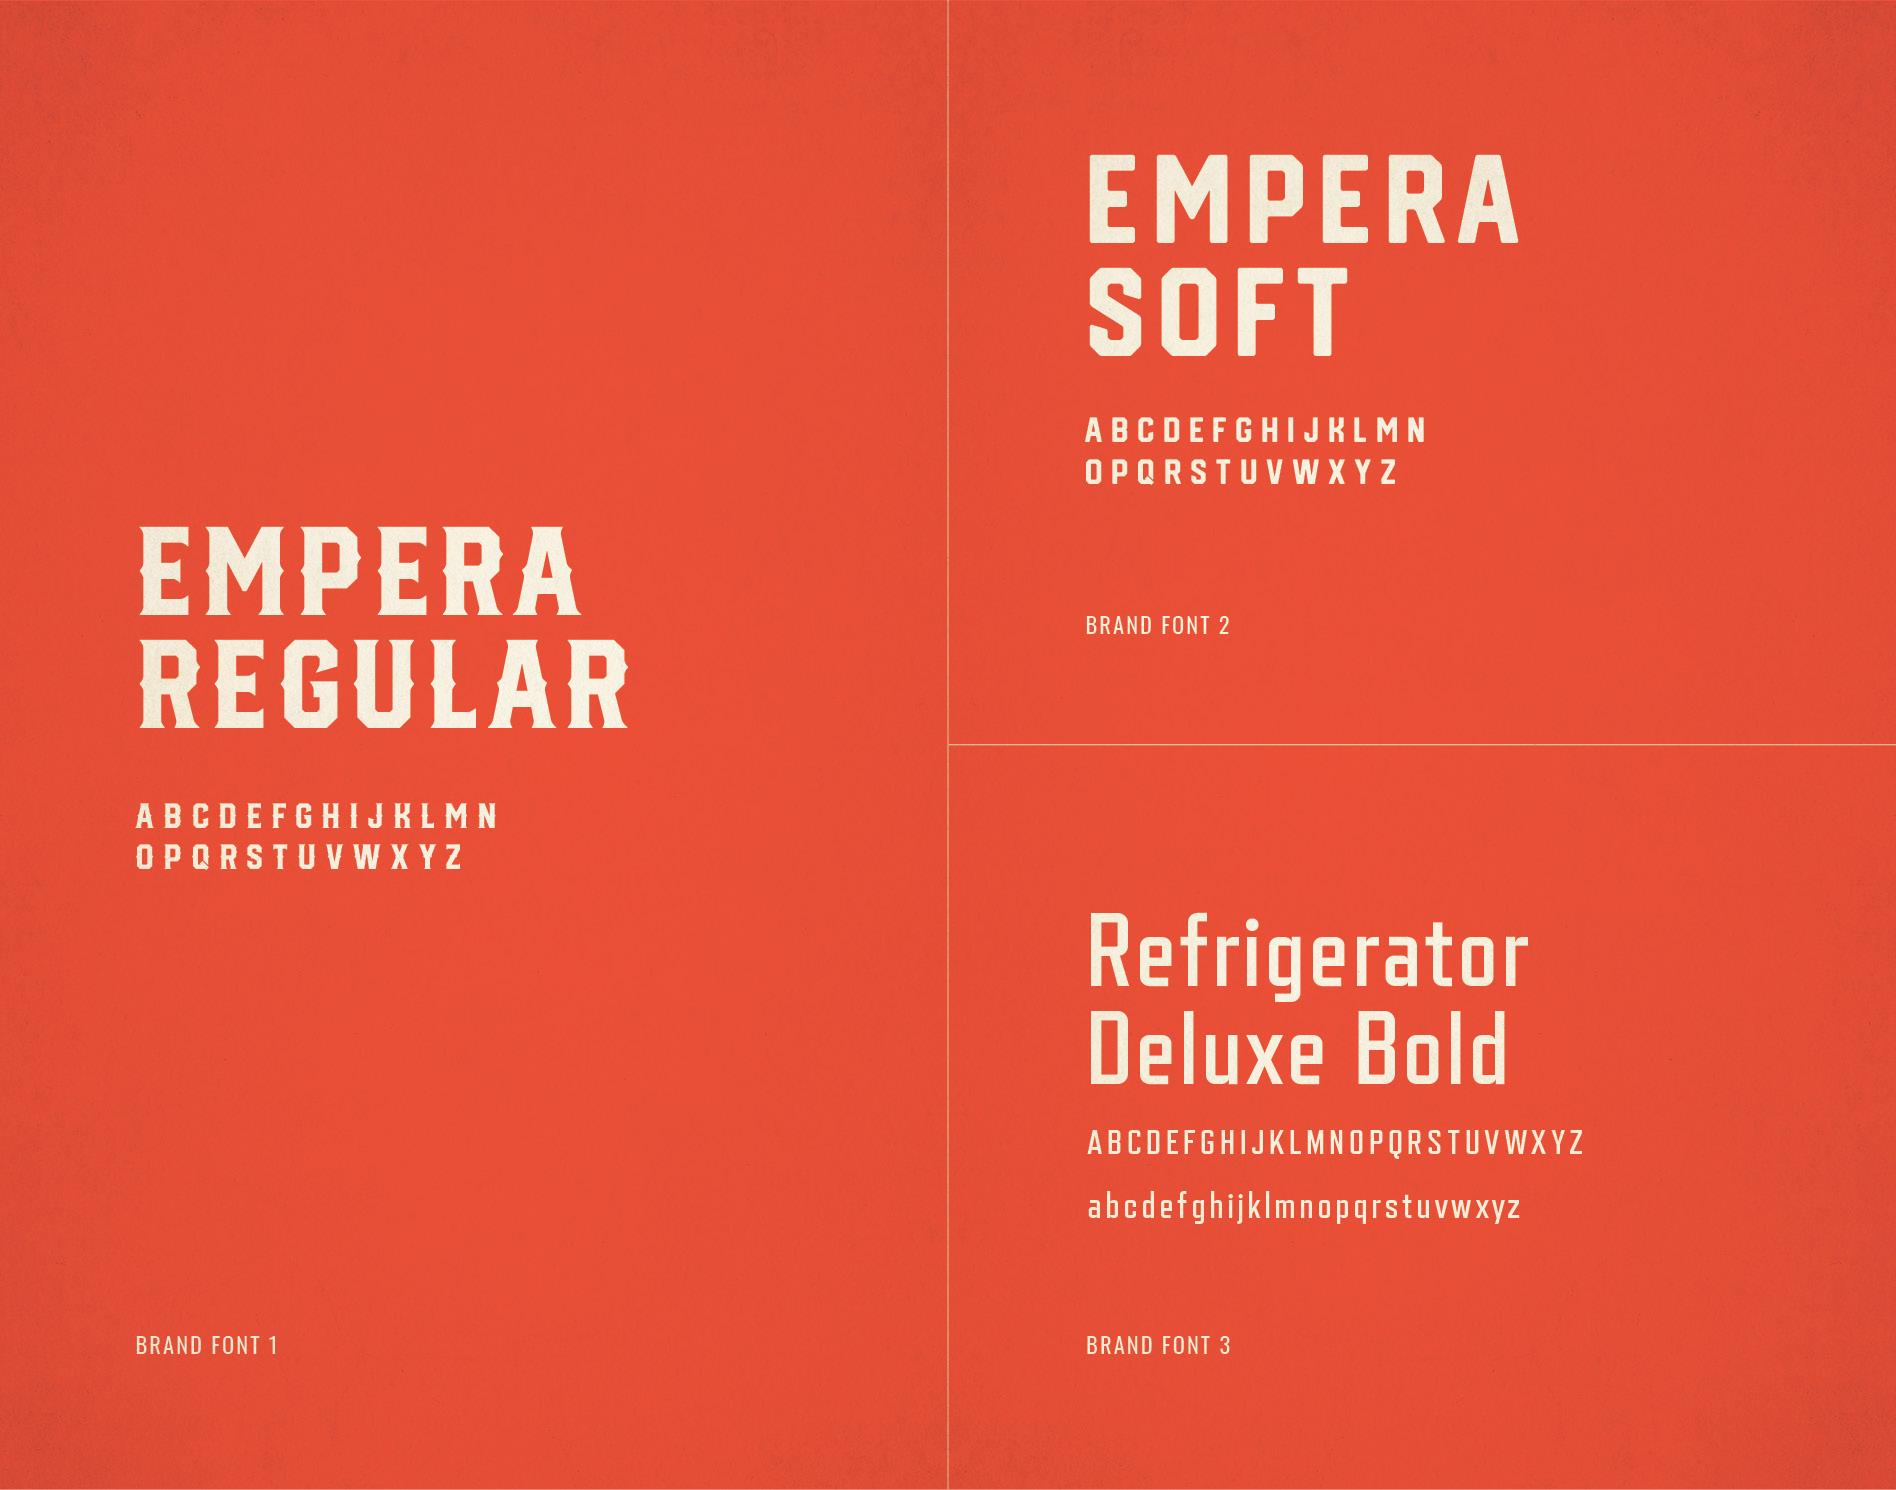 branding fonts